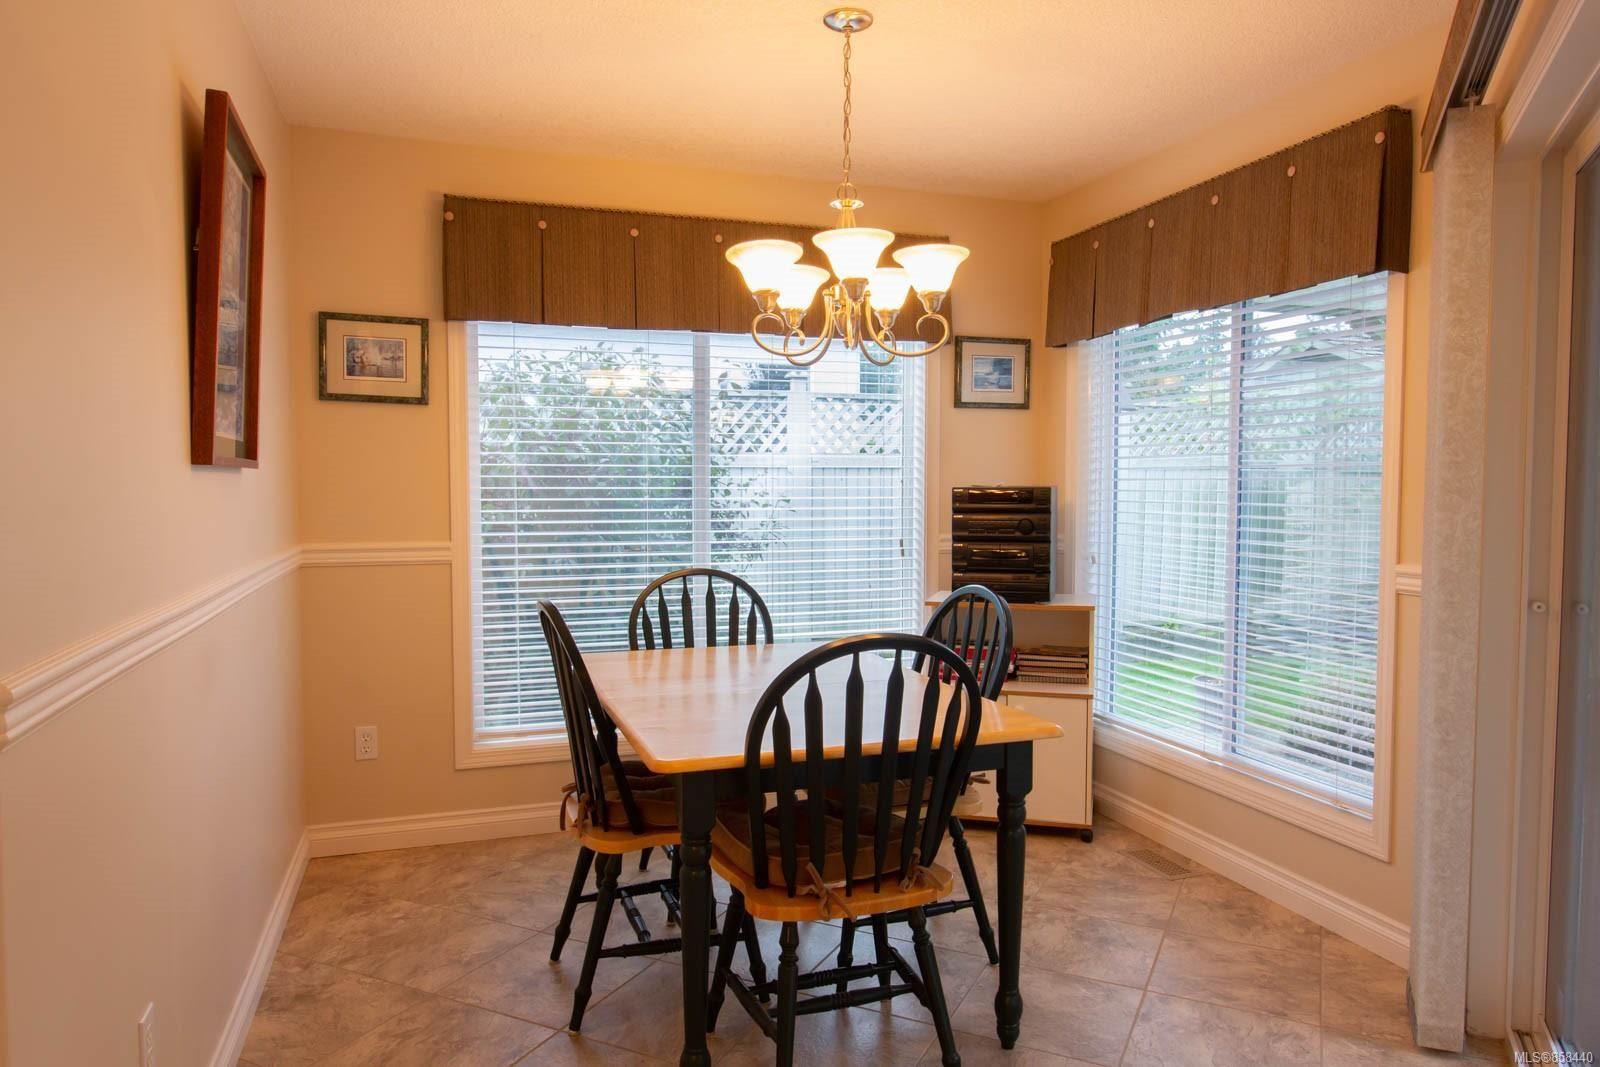 Photo 5: Photos: 798 Devon Pl in : PQ Qualicum Beach House for sale (Parksville/Qualicum)  : MLS®# 858440